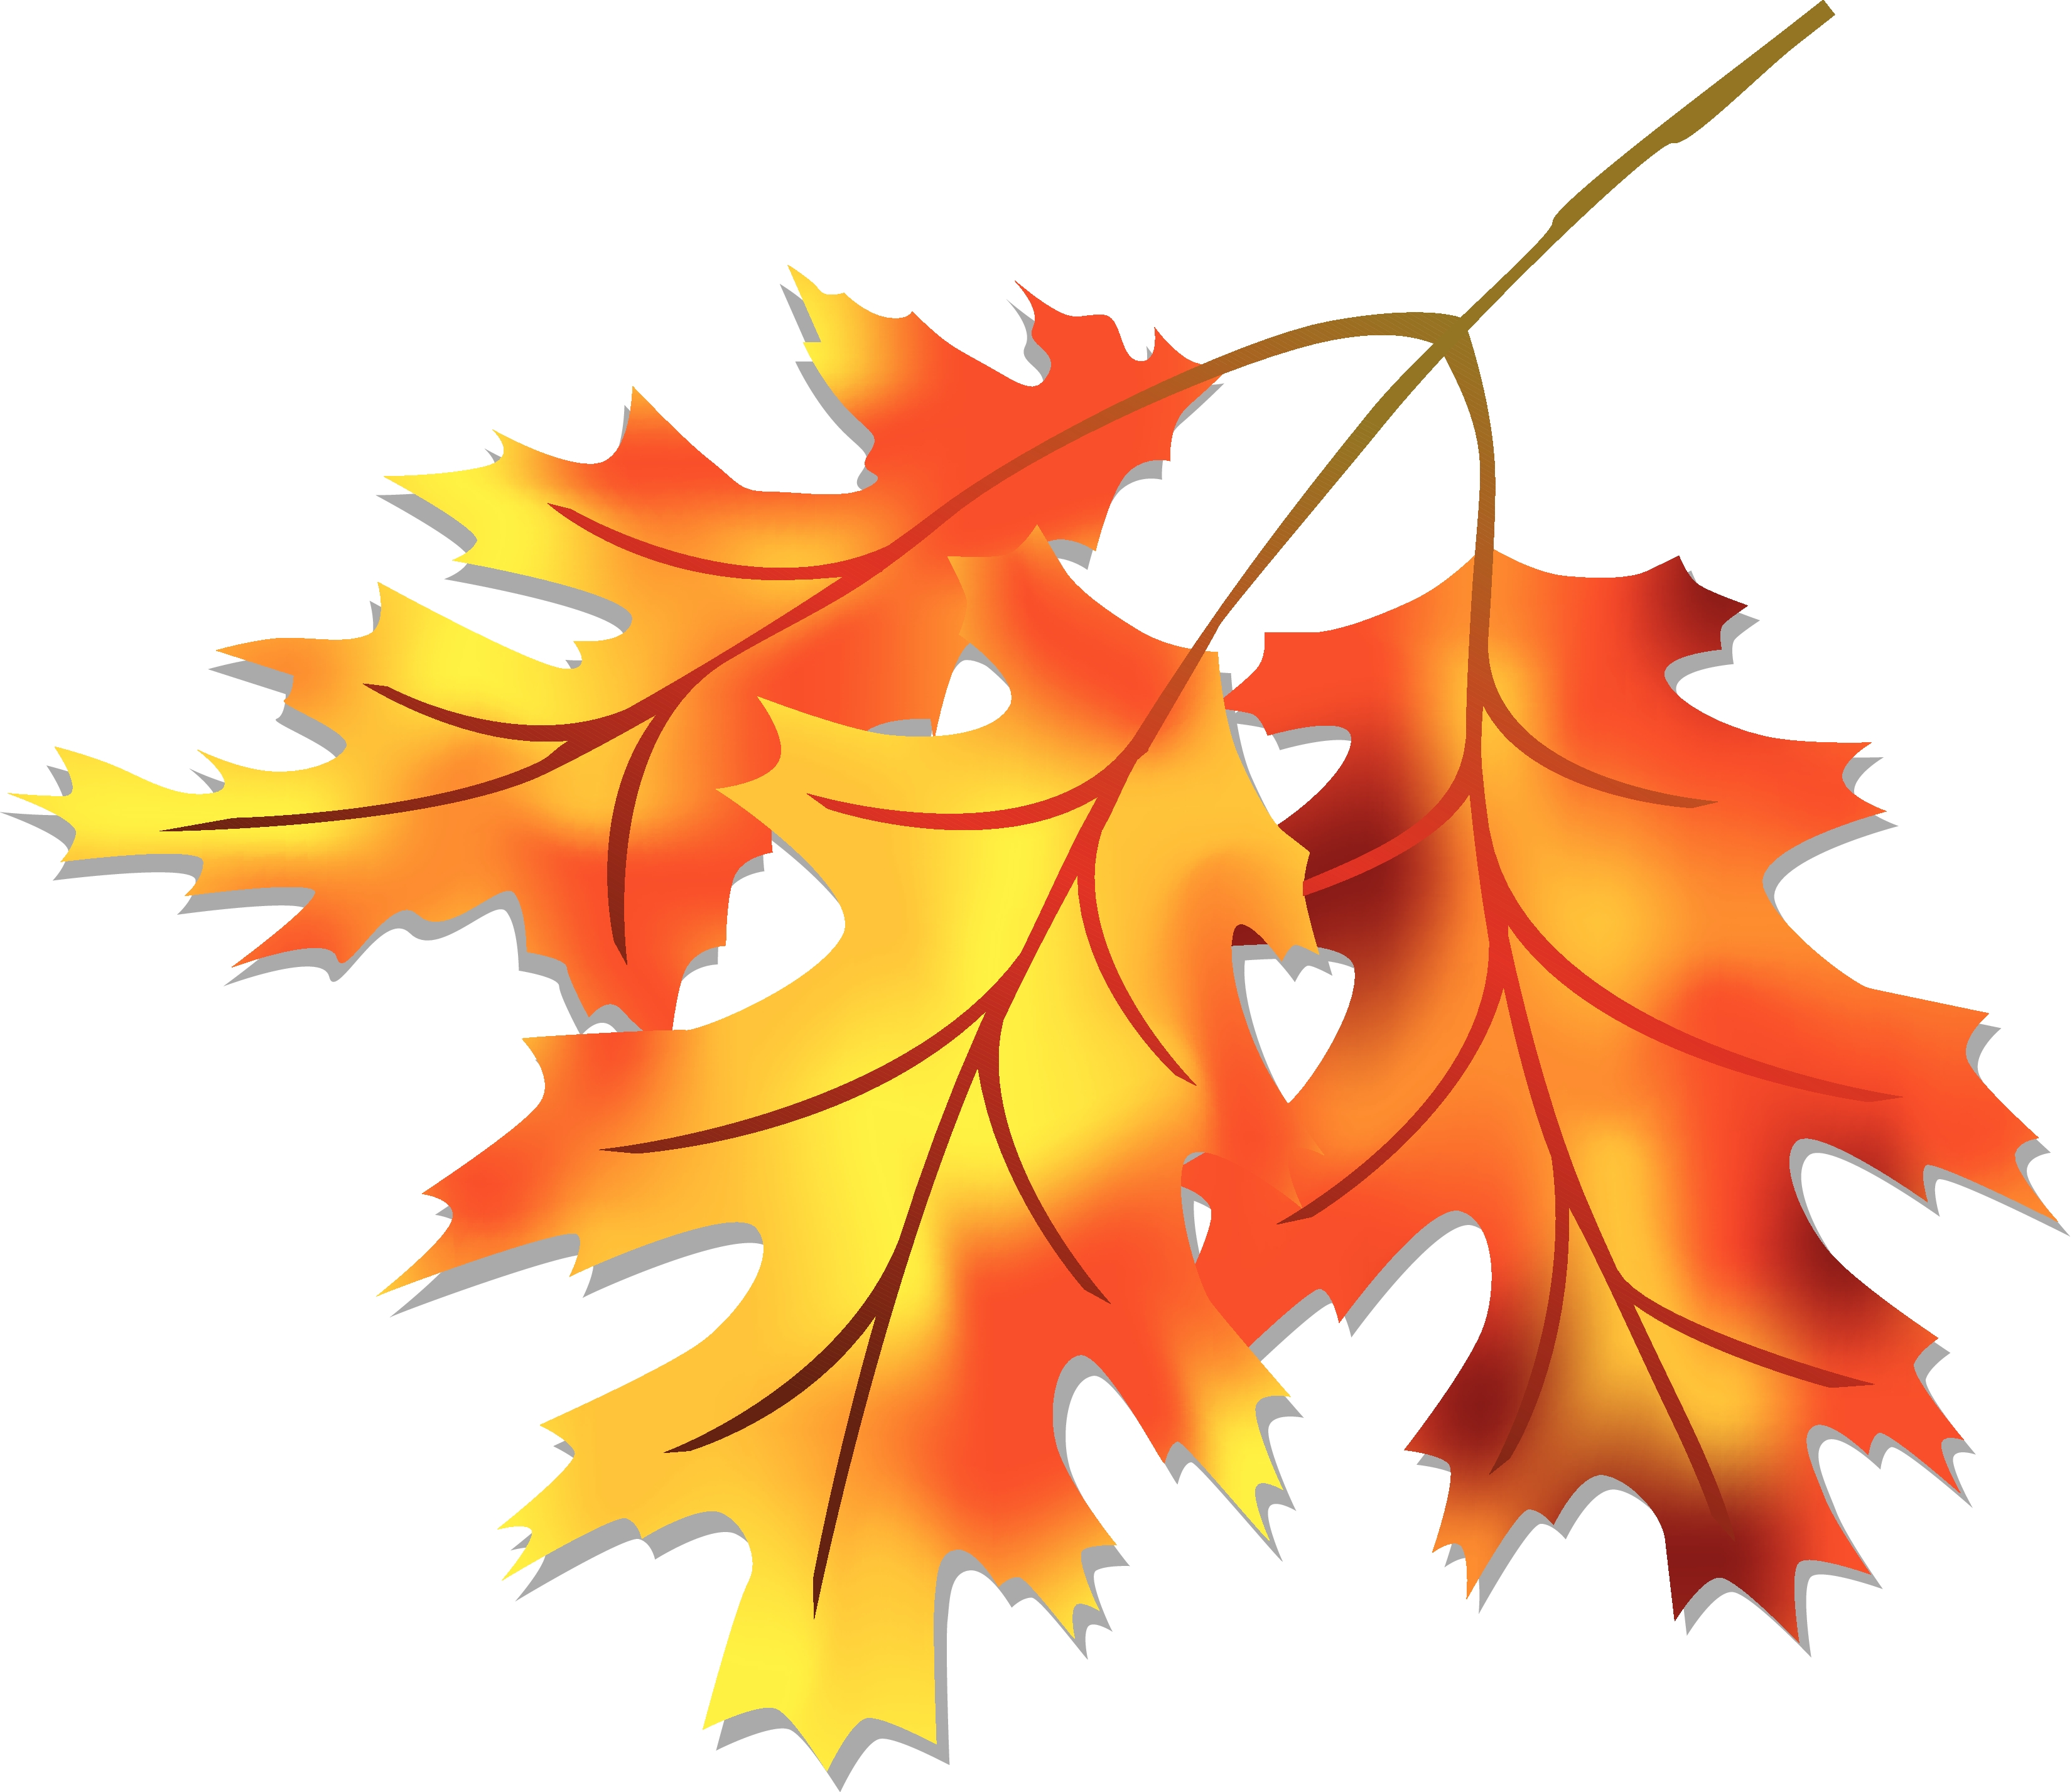 Leaves clipart autumn leaves Com leaves Falling Fall leaves